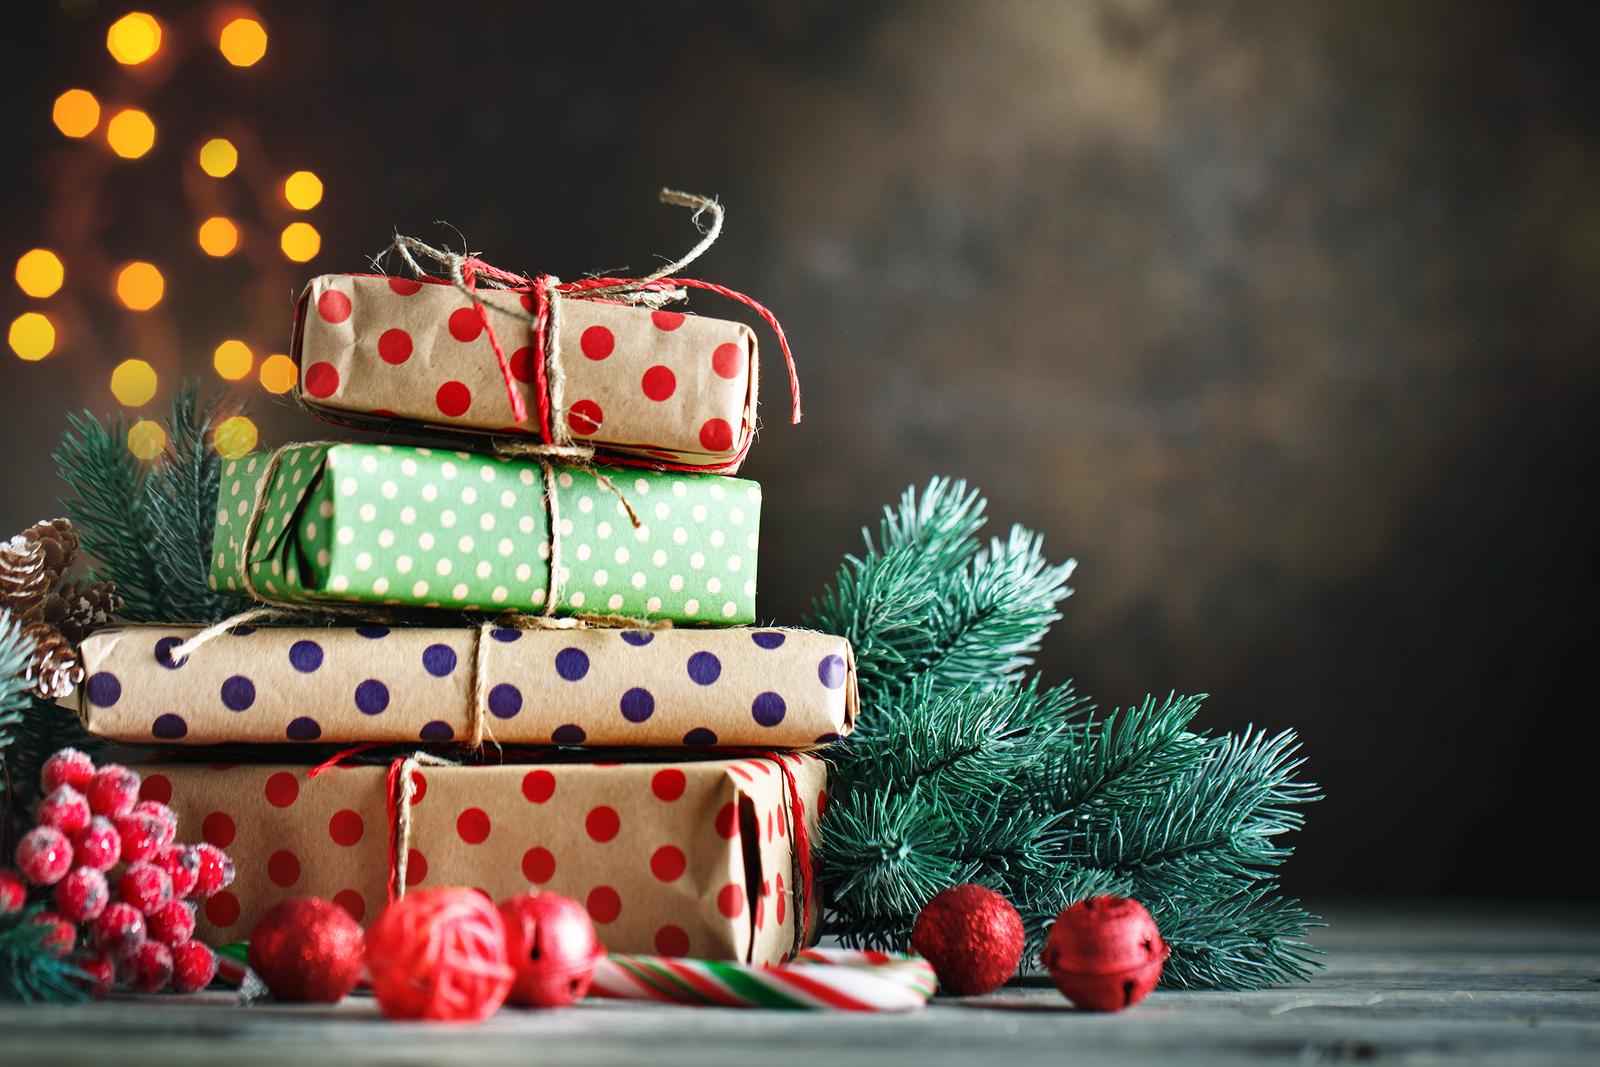 Christmas presents-travel healthcare jobs dec 24-Christmas Eve